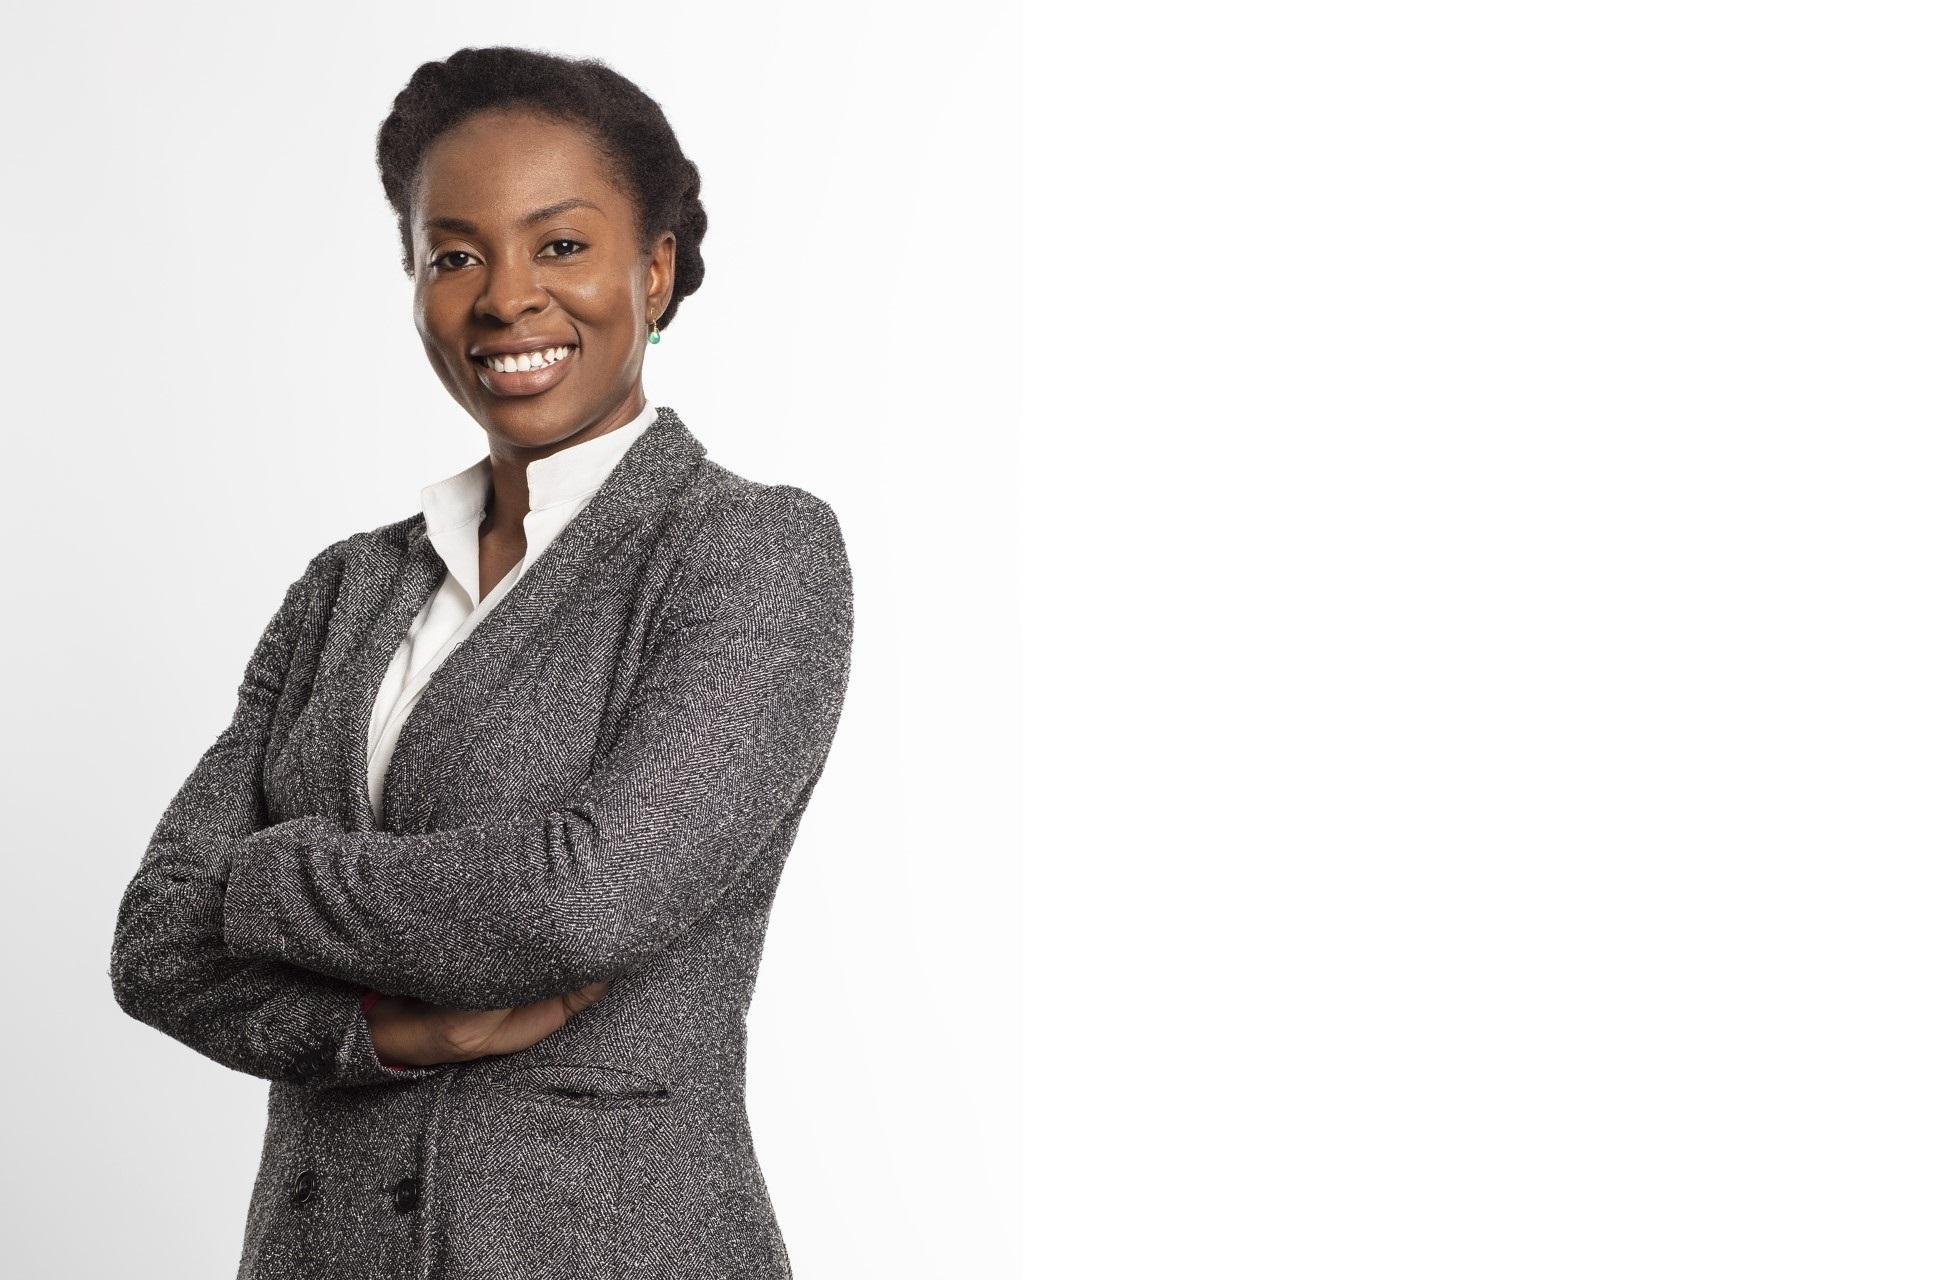 MANSAG Trainee Travel Fellowship 2019 award winner – Dr ISIOMA OKOLO